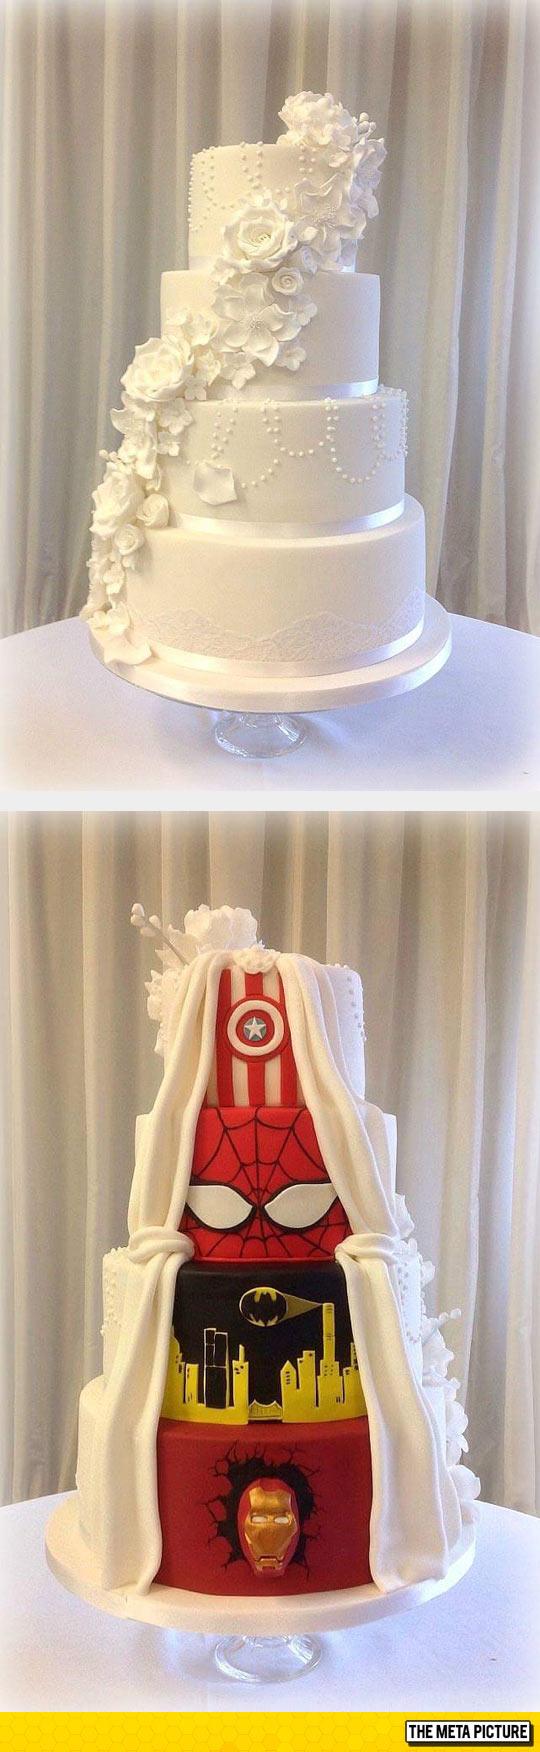 cool-cake-wedding-superhero-colors